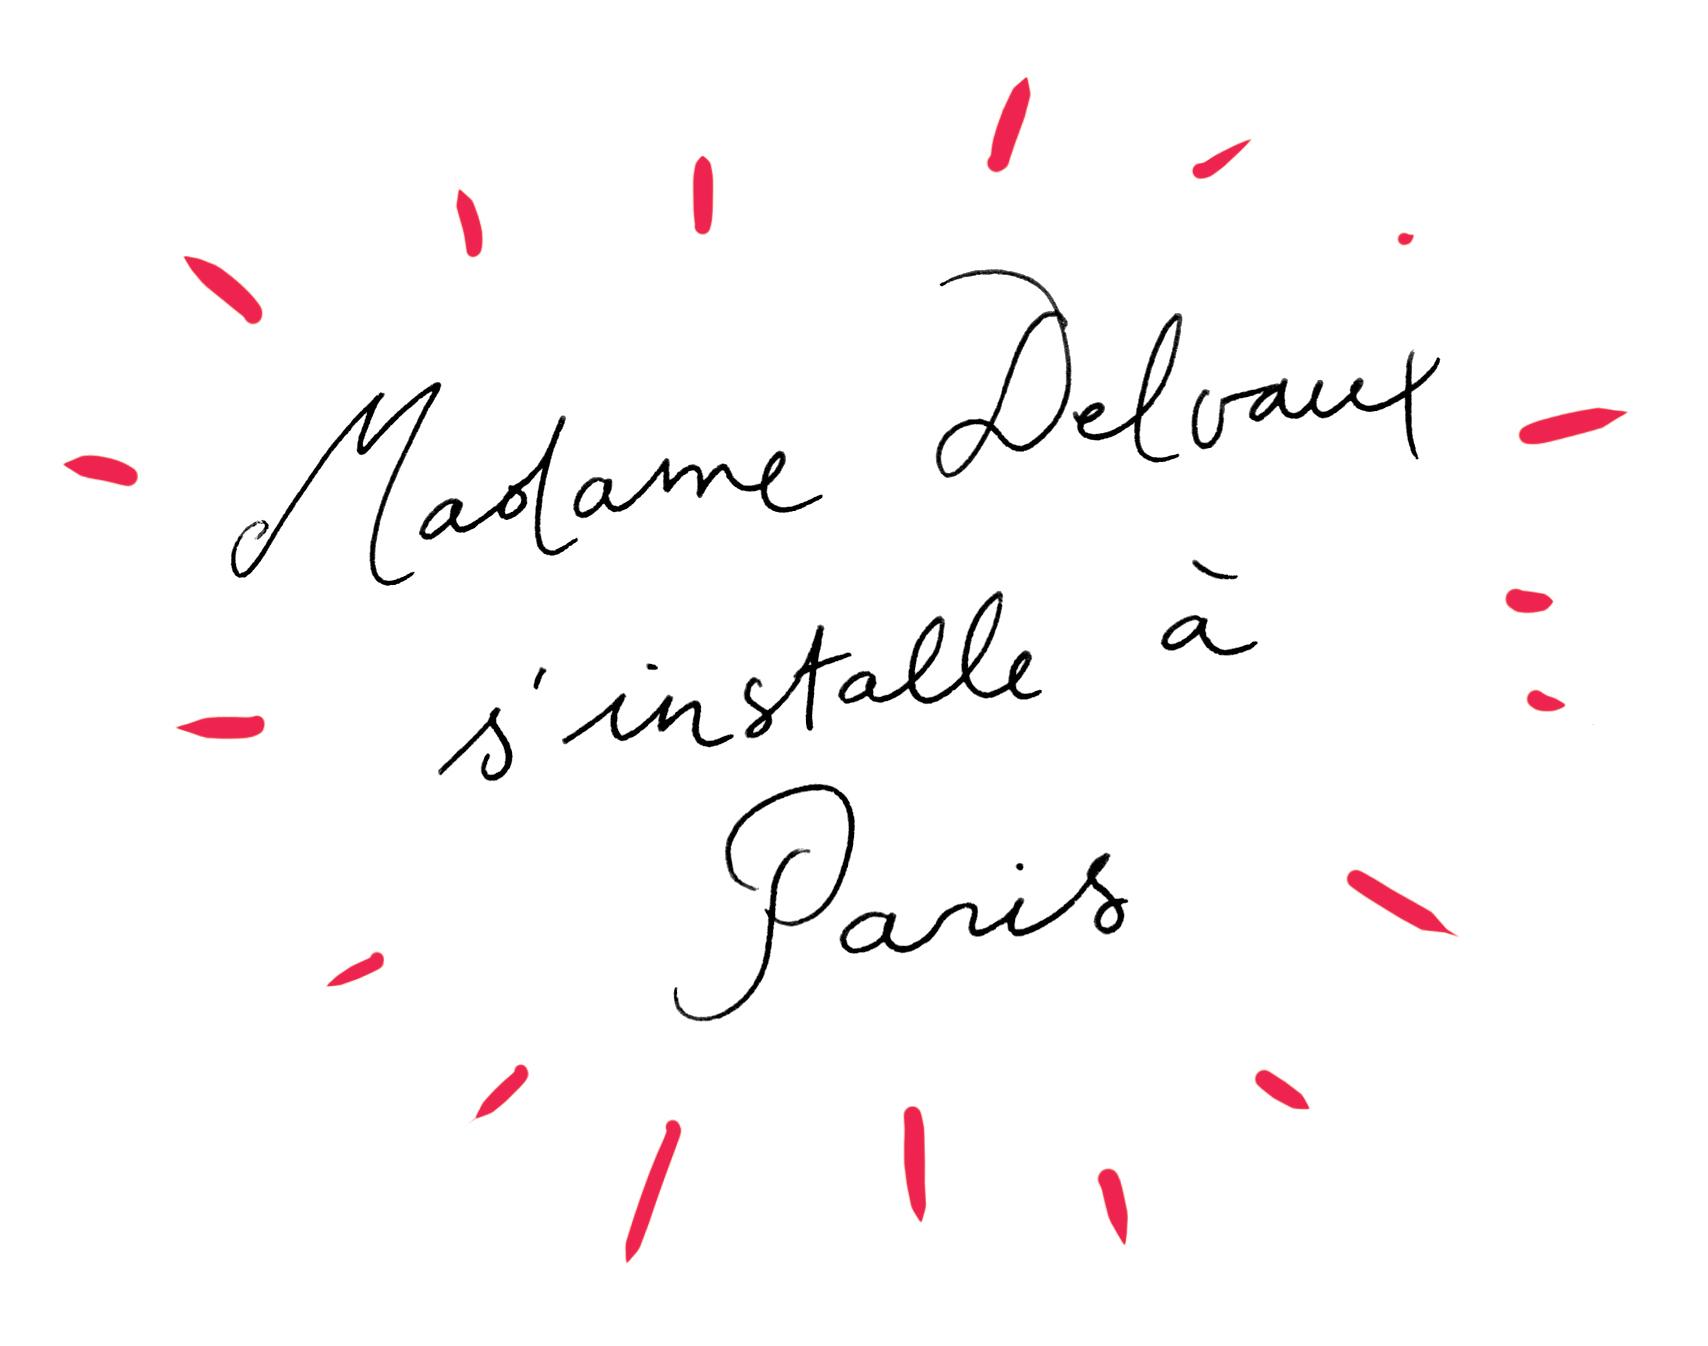 Delvaux palais royal texte.jpg